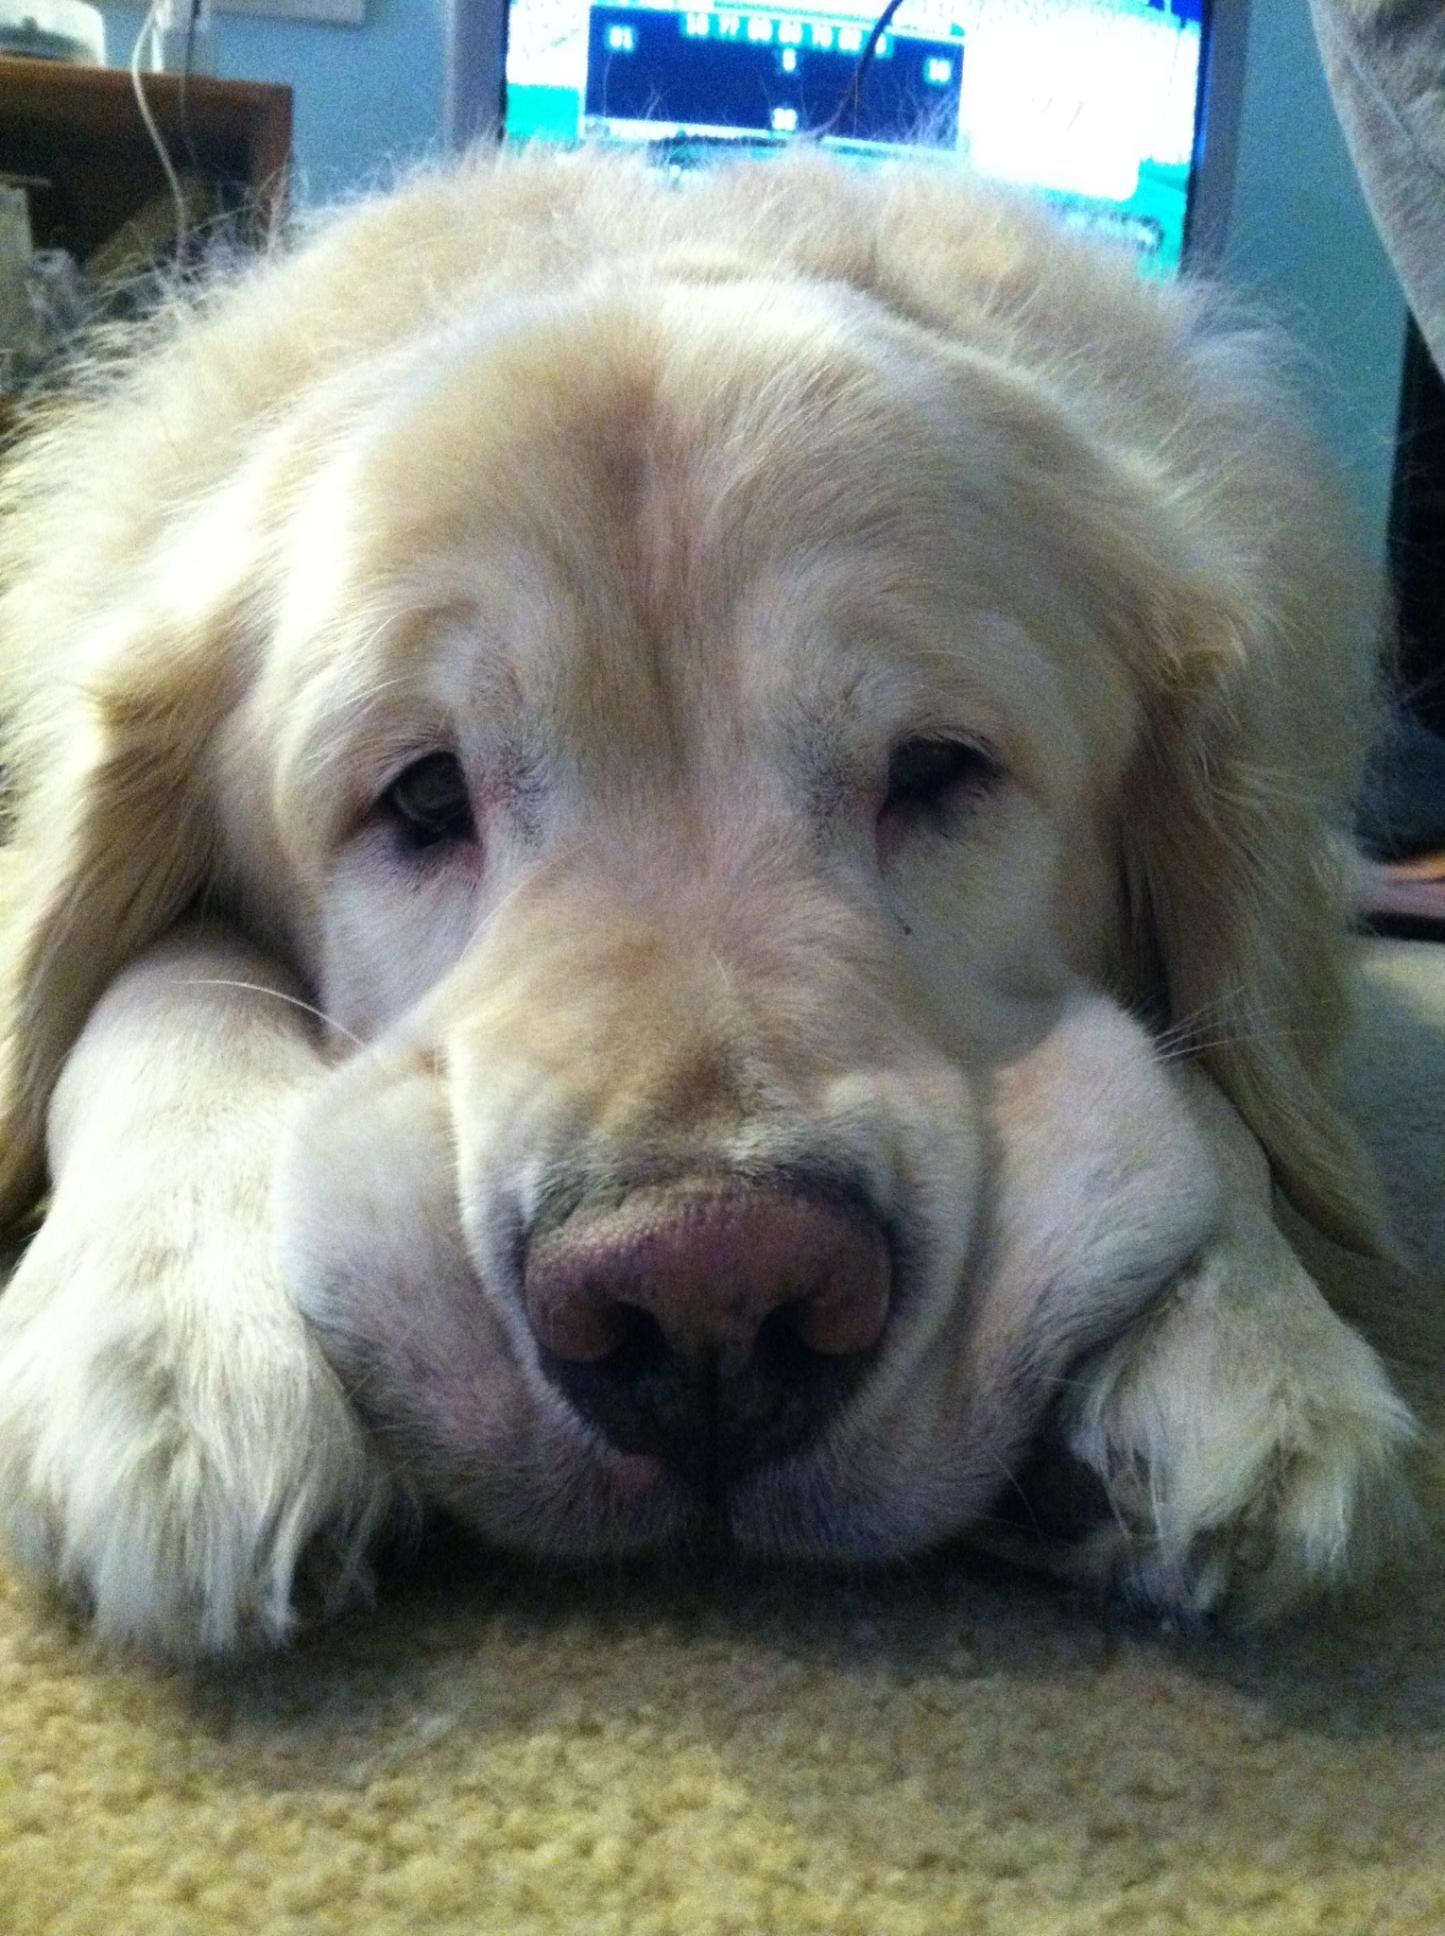 Fantastic Cdog Chubby Adorable Dog - b695b207e73380b5a3d6e1065cd37e5f  Snapshot_829645  .jpg